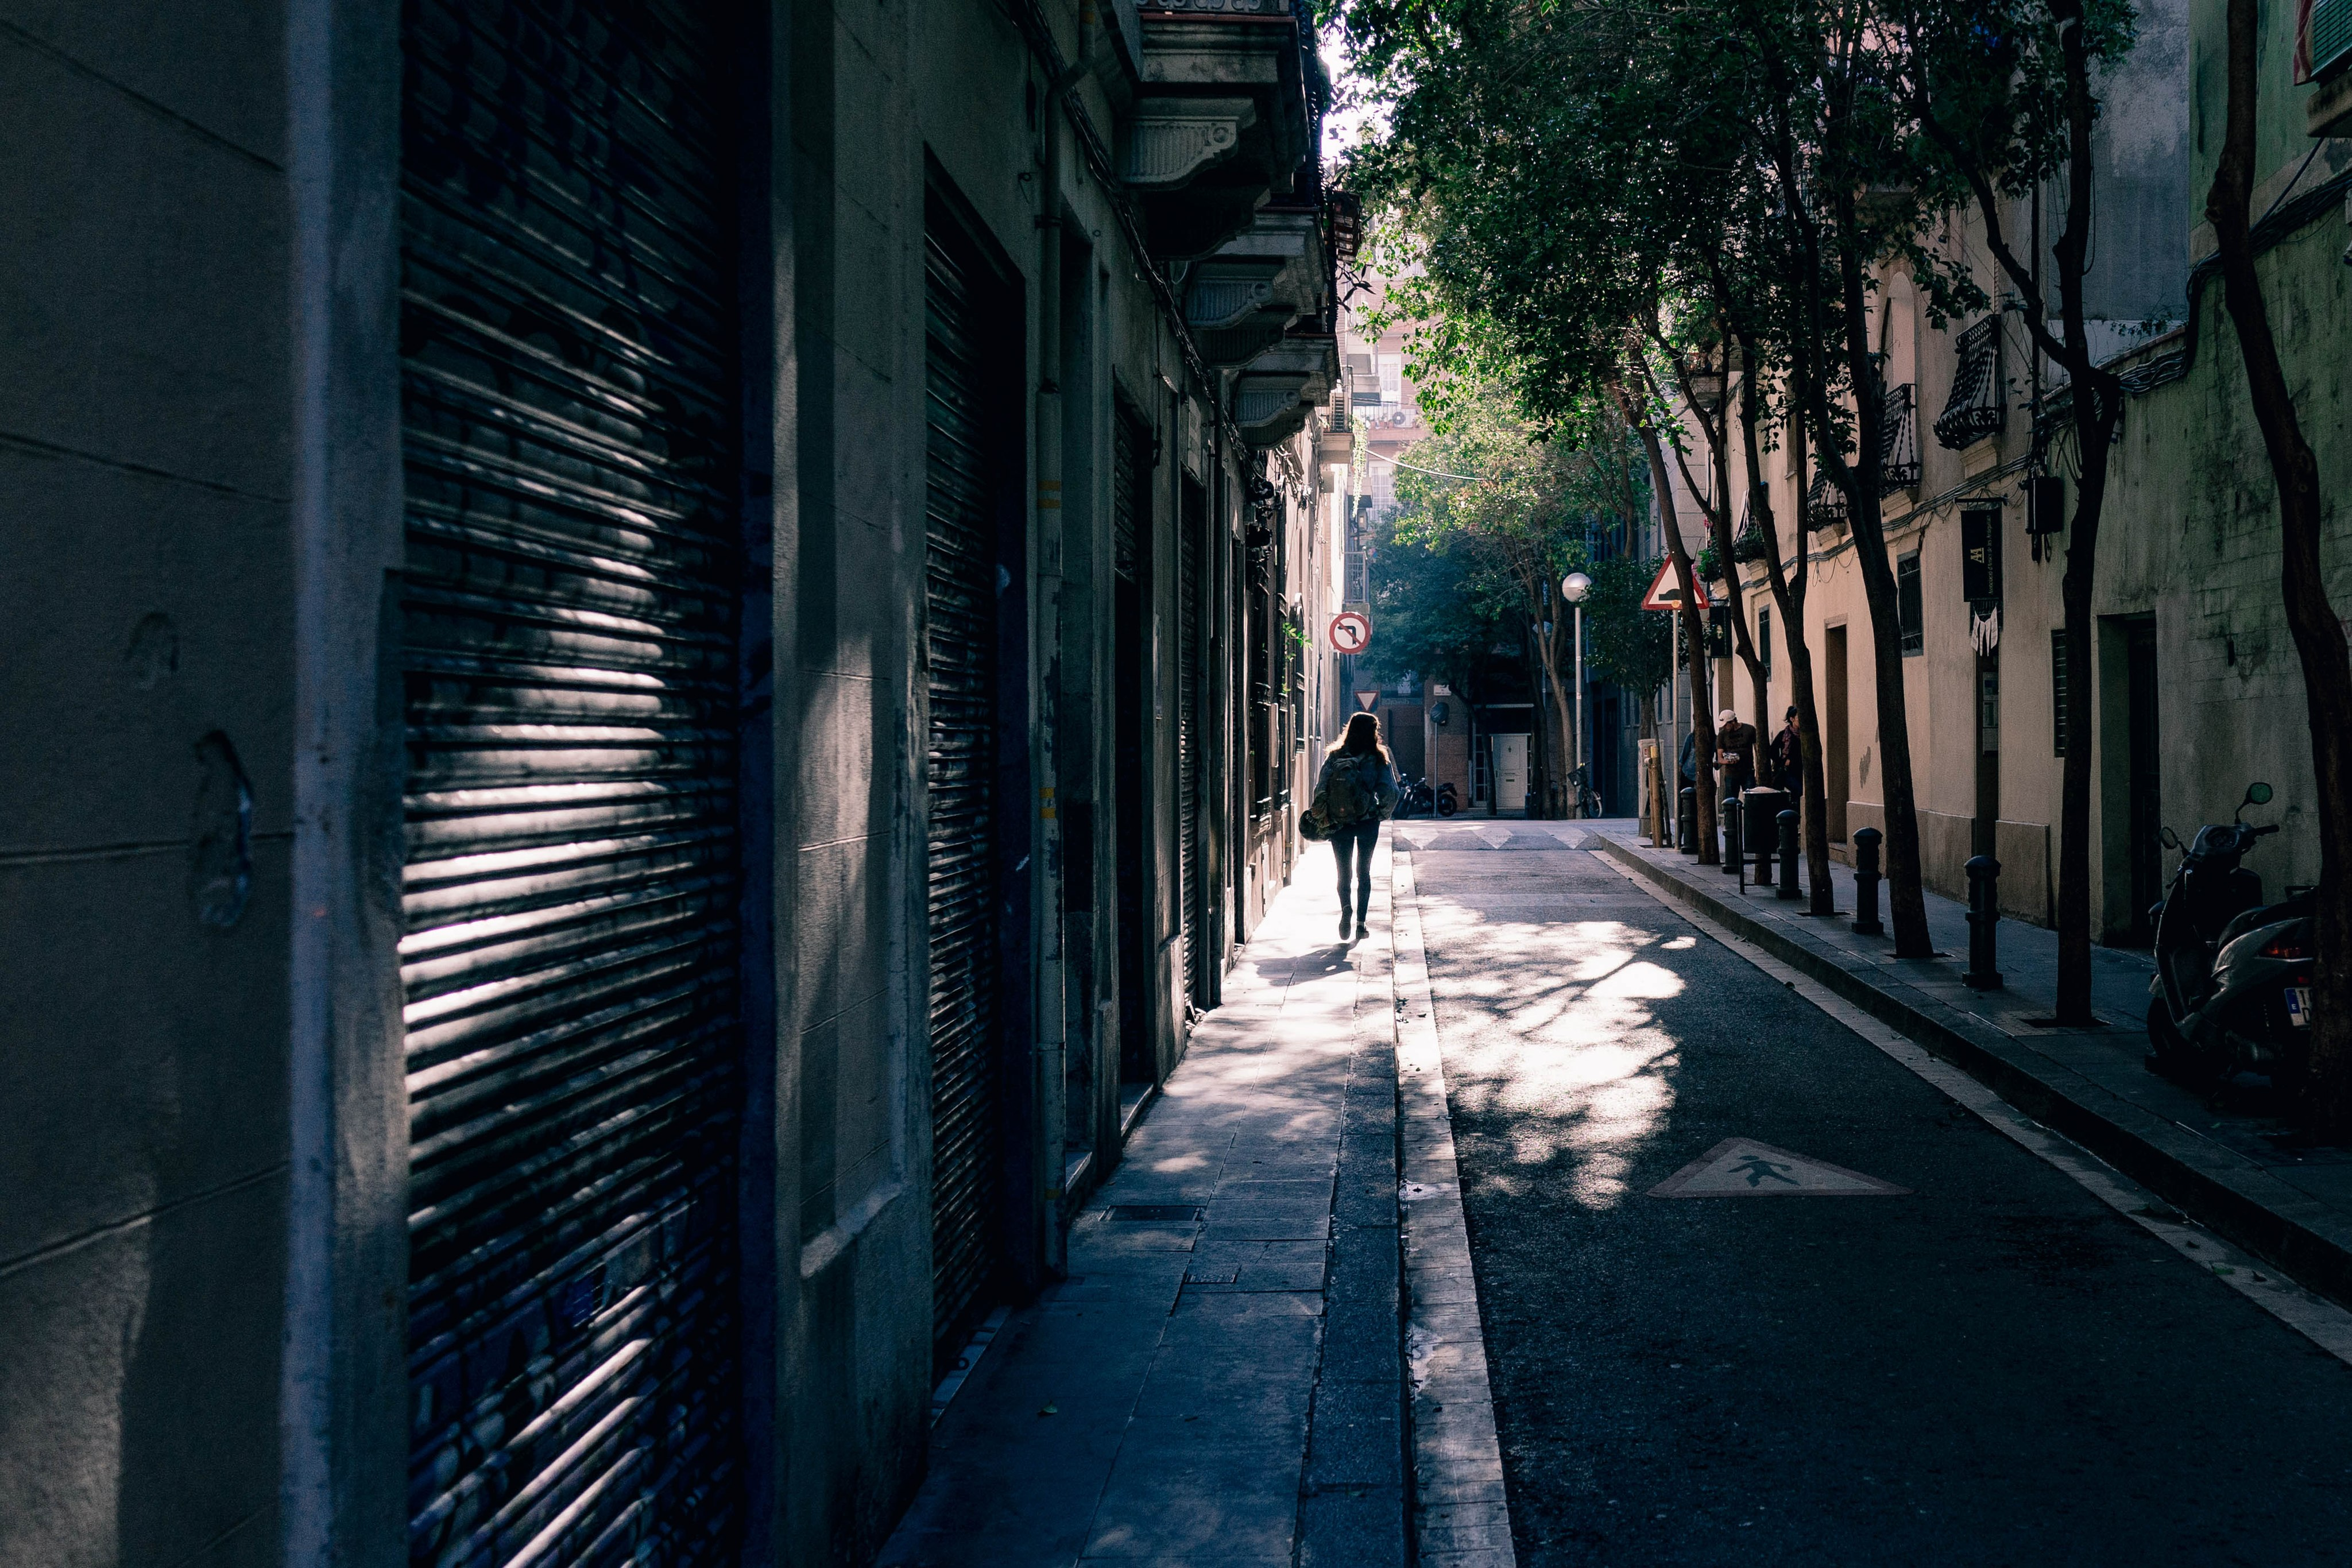 Lonely Girl (Unsplash)